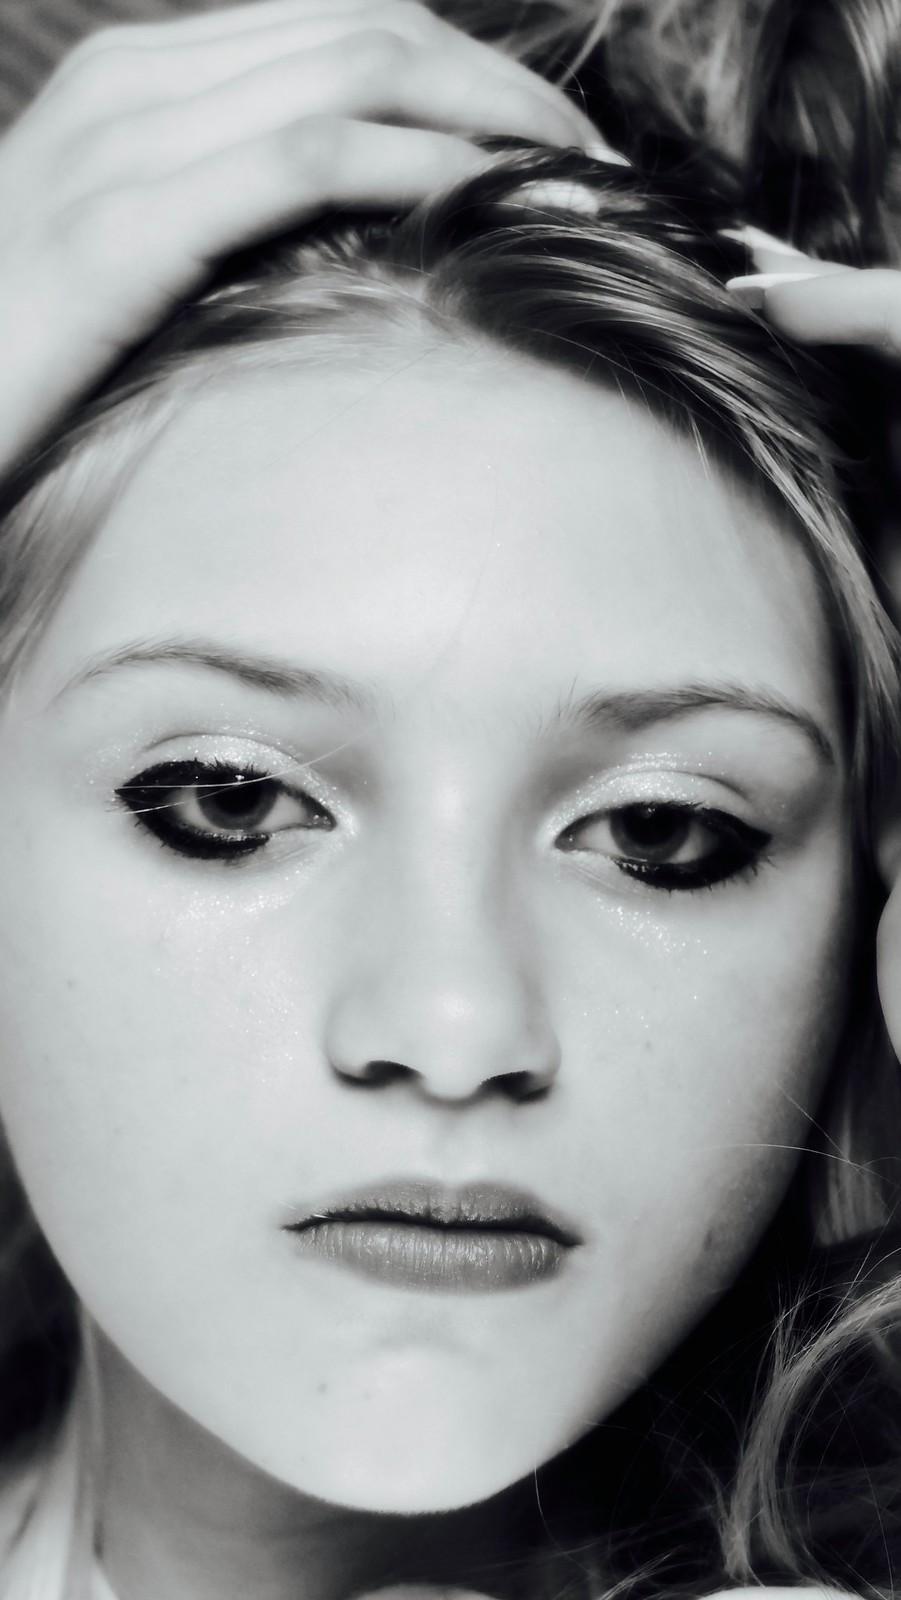 Mila - Sadness